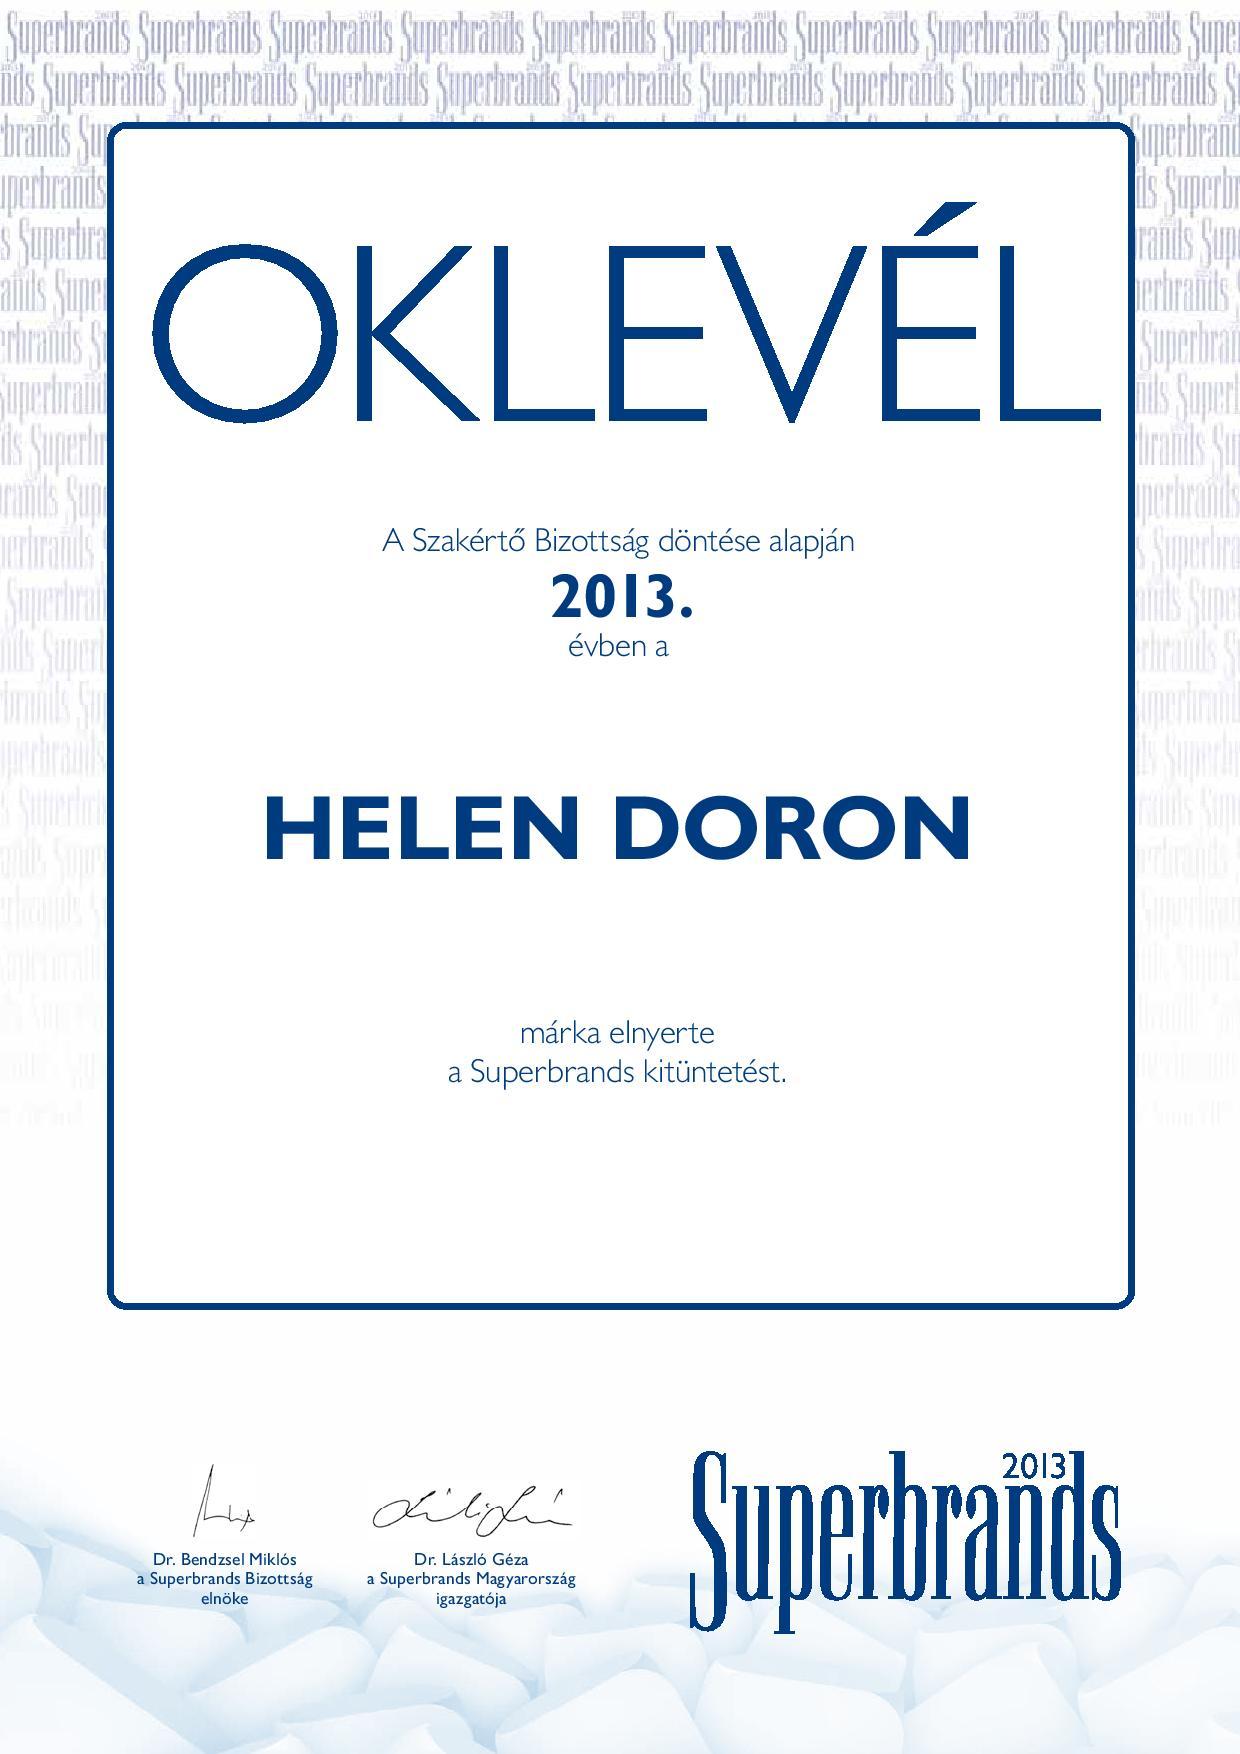 2013-ban Superbrand lett a Helen Doron angol gyerekeknek!